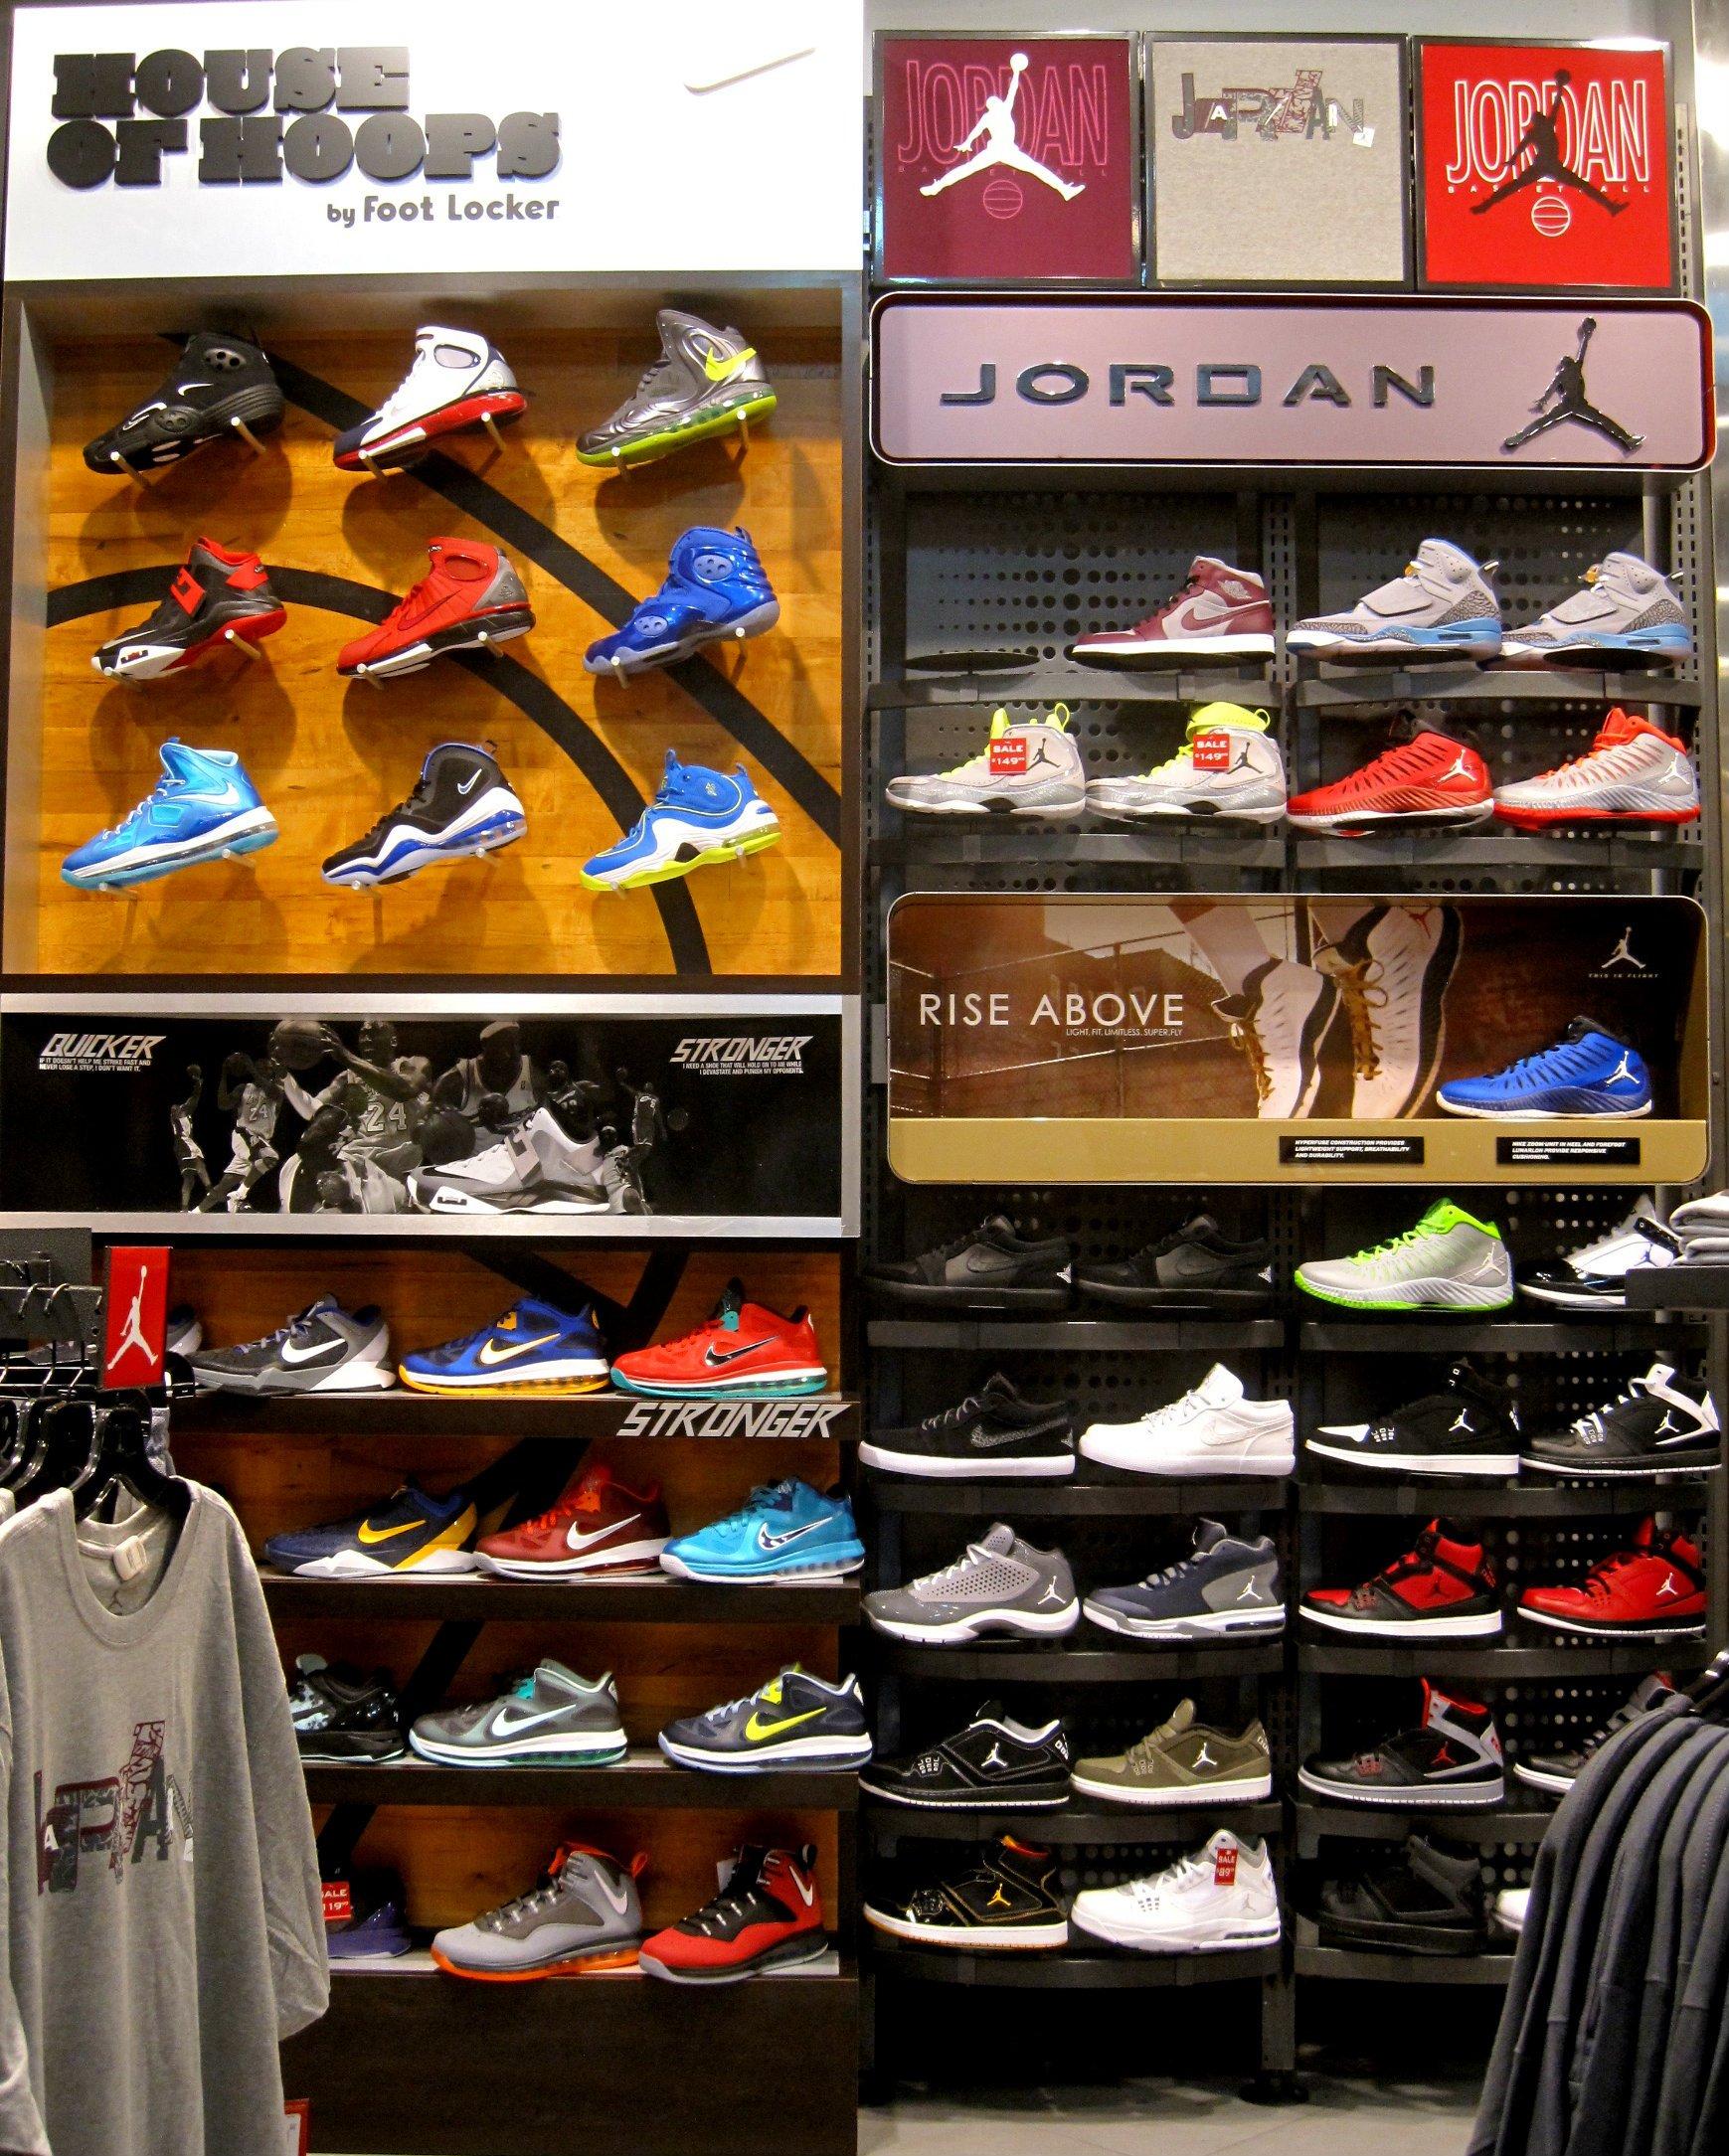 b6407776f8393f Foot Locker Jordan Shirt